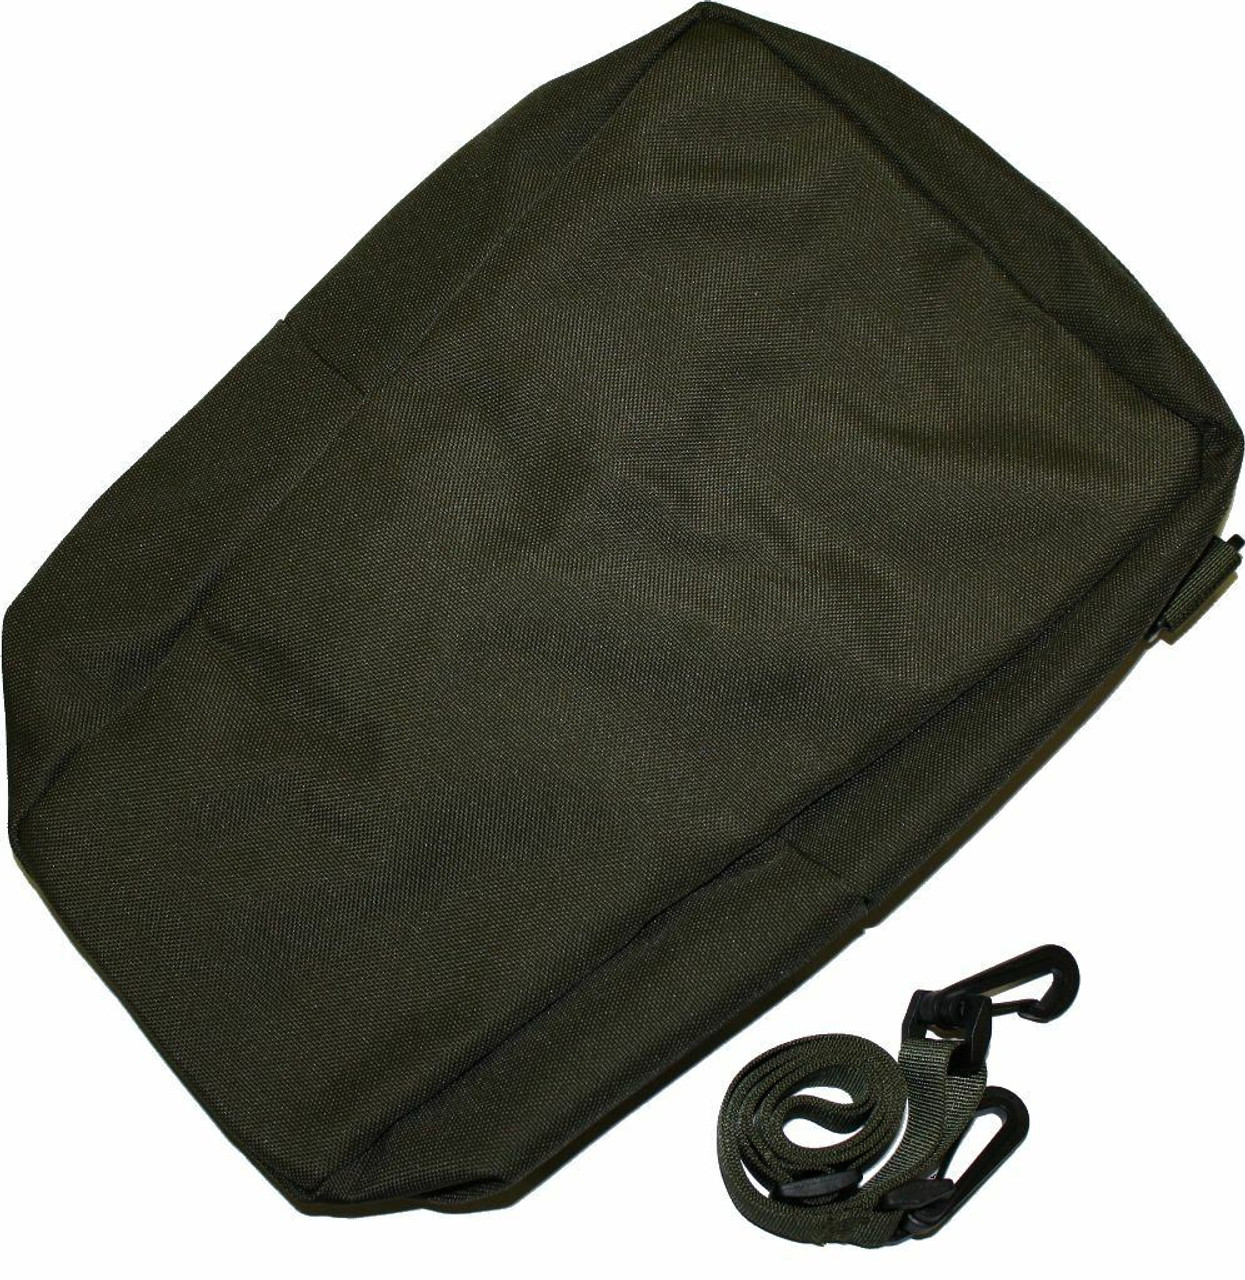 AN/PVS-7 PVS-14 6015 Night Vision OD Green Soft Carry Case Bag w/ Shoulder Strap